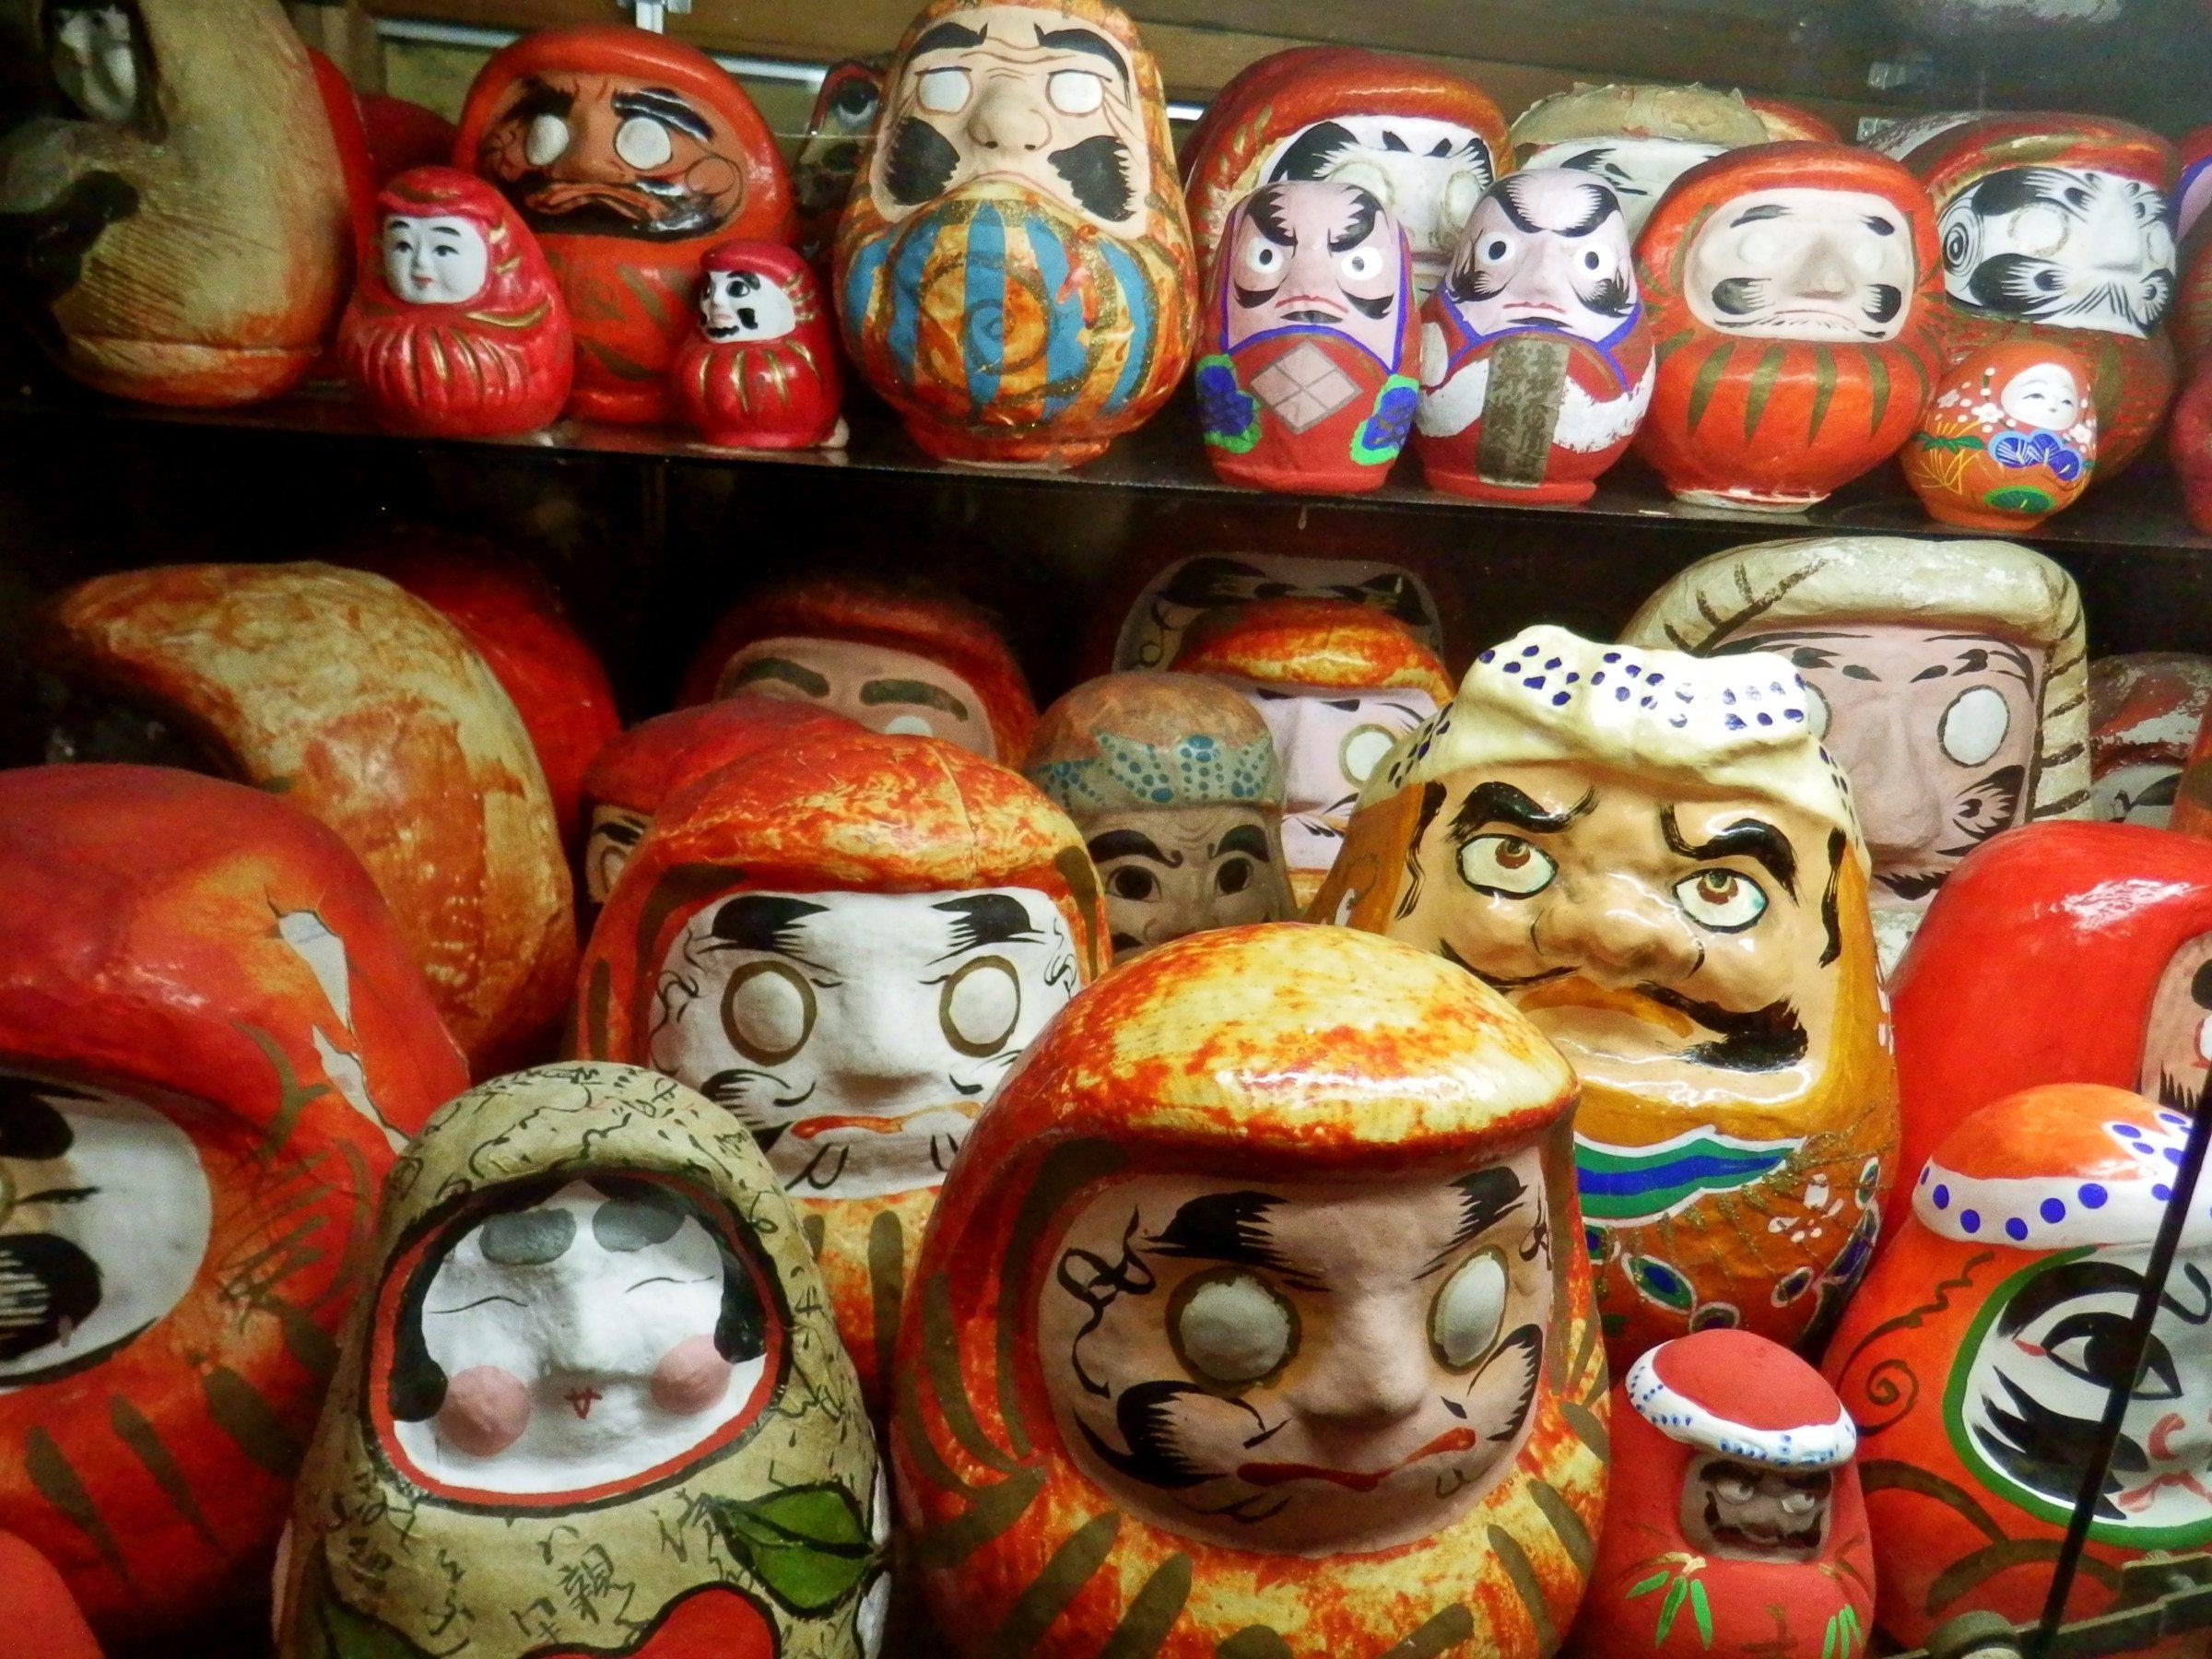 Daruma dolls in the Rural Toy Museum